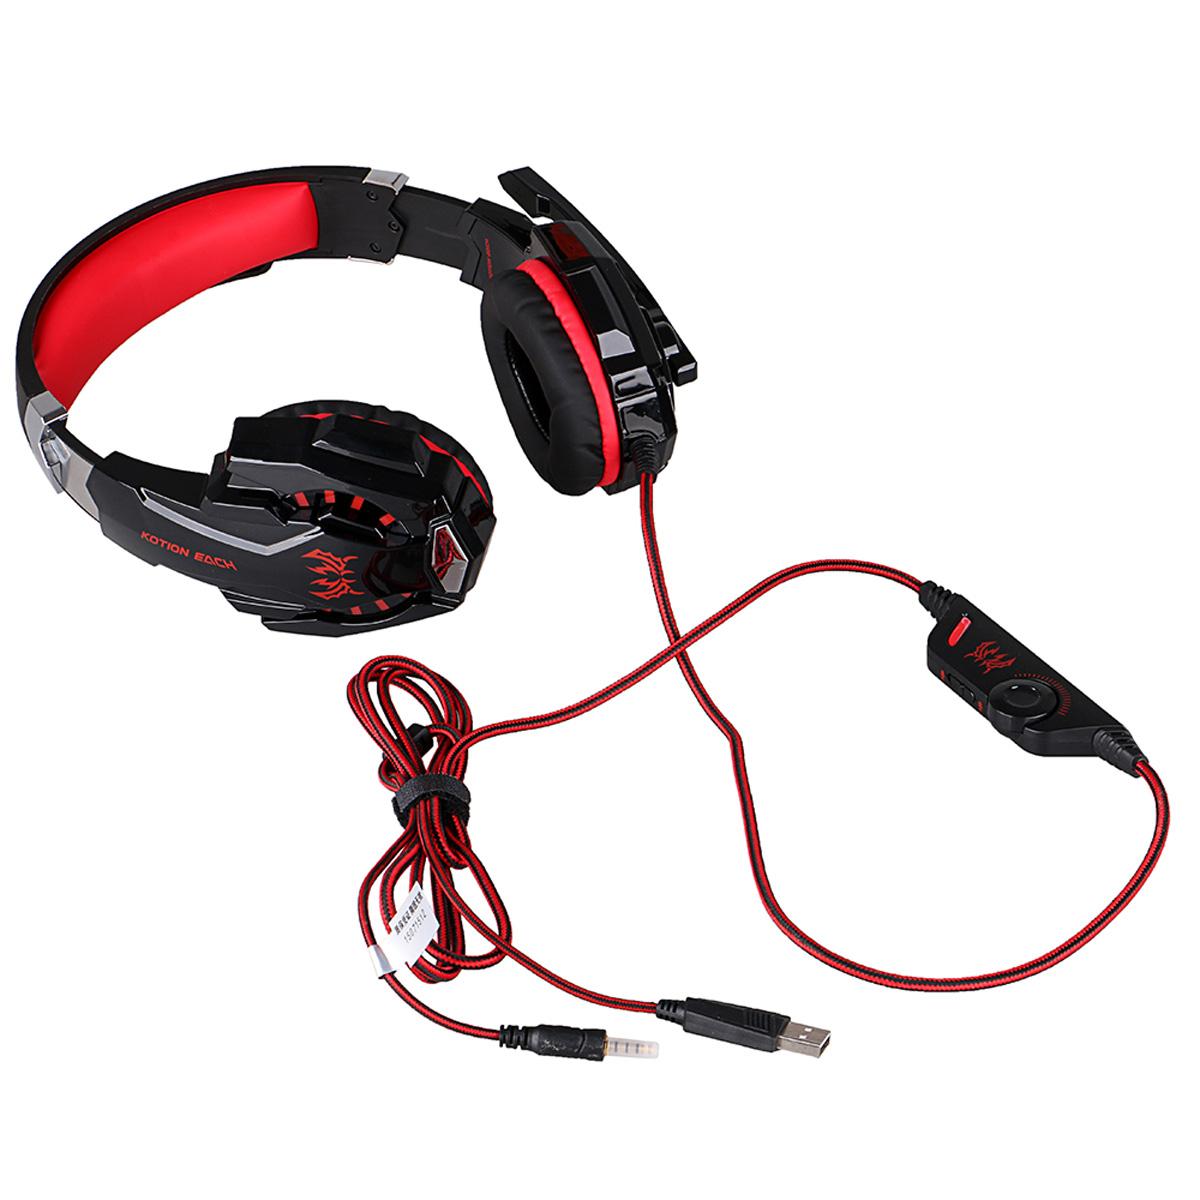 Kotion Each G9000 Stereo Gaming Headset Headphones